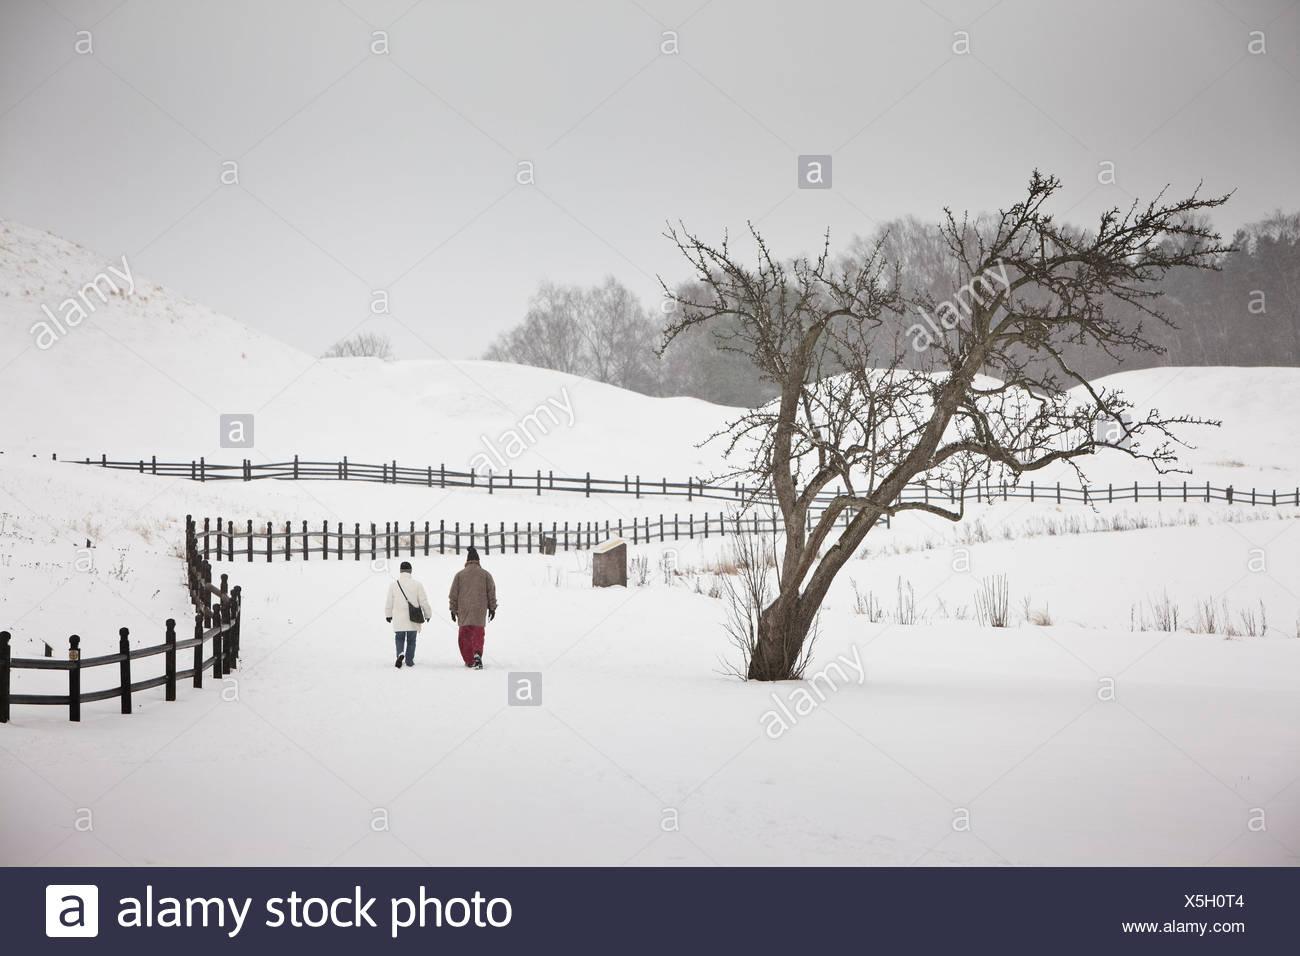 Sweden Snow Fence Tree Stockfotos & Sweden Snow Fence Tree Bilder ...